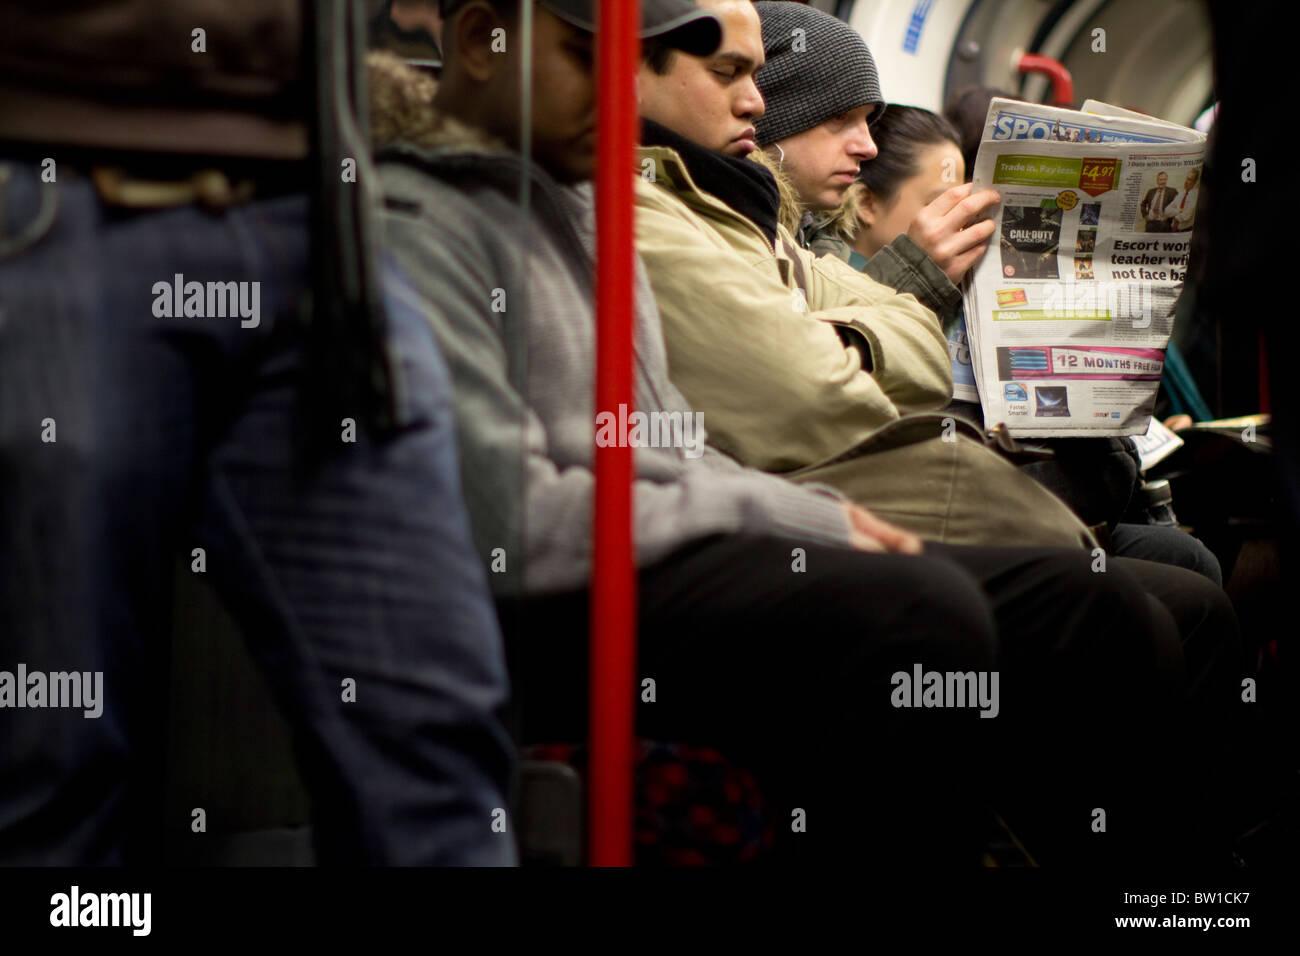 Escort in london underground pics 767